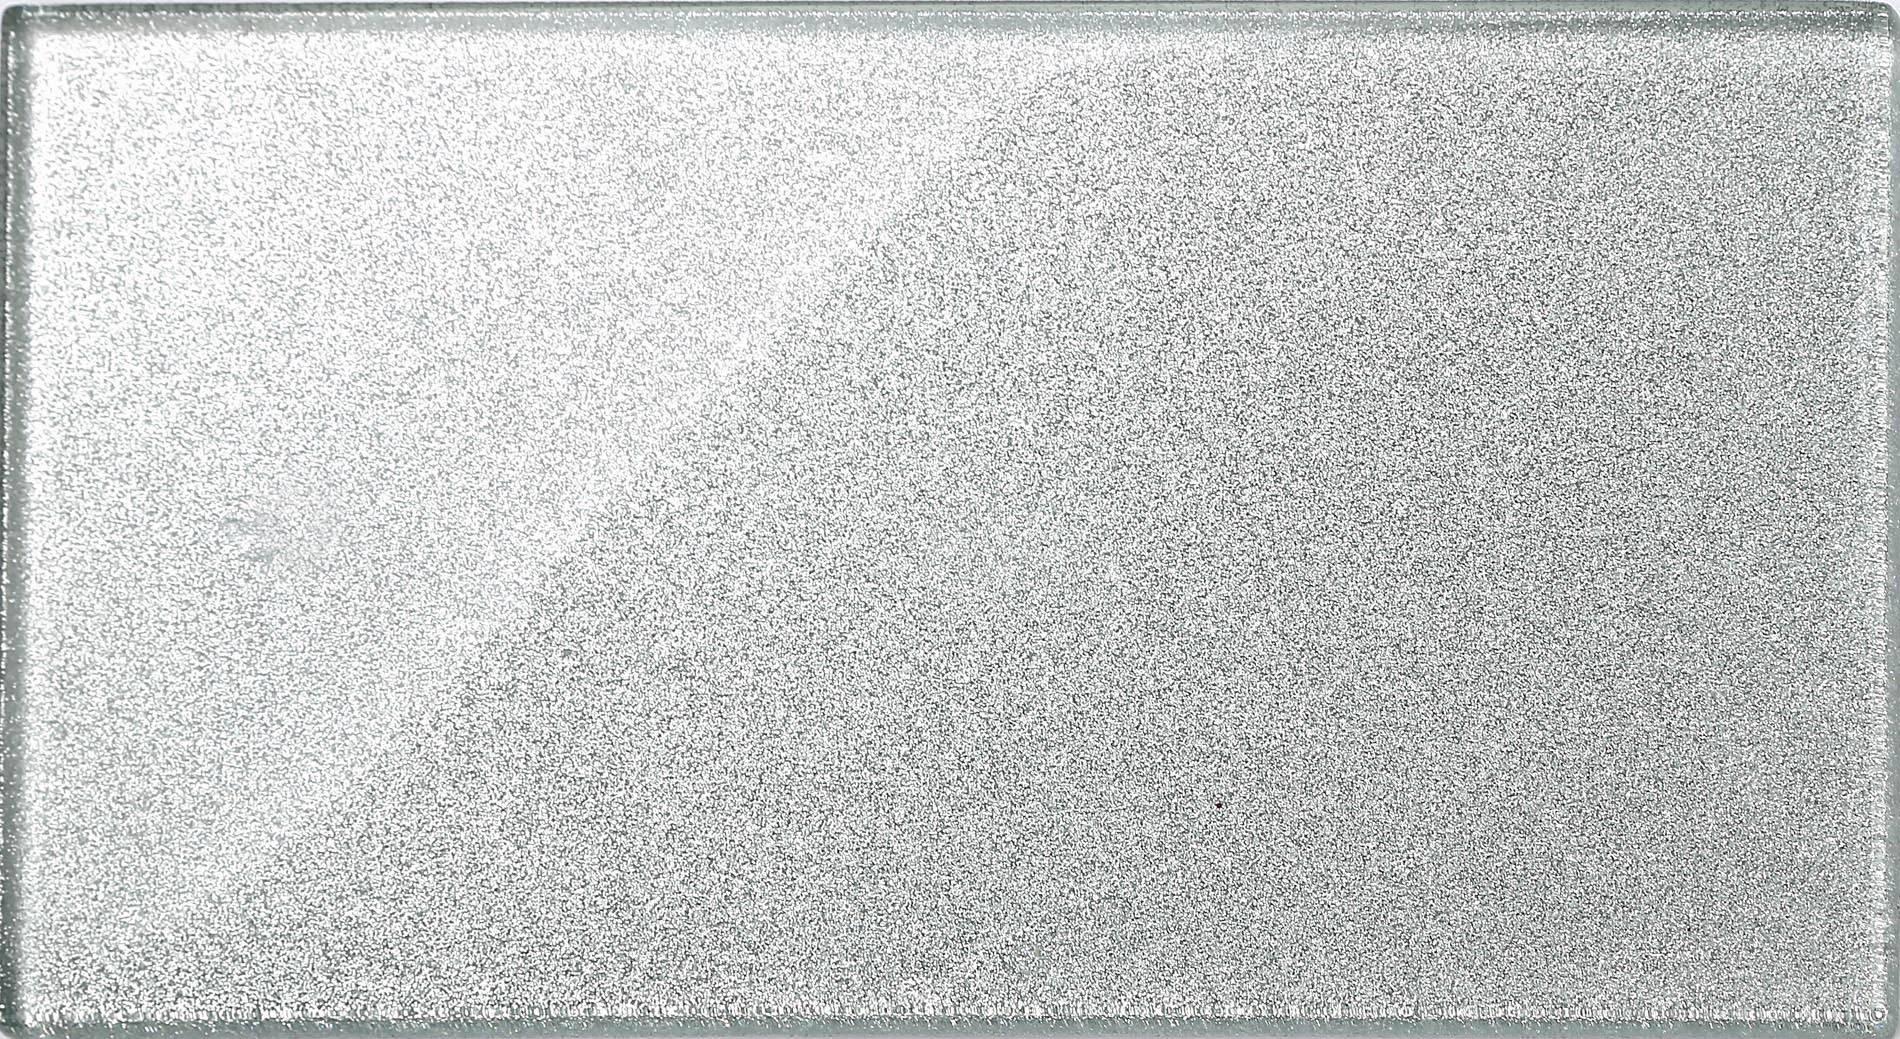 Silver Glitter Glass Tiles Bathroom Bath Splashback